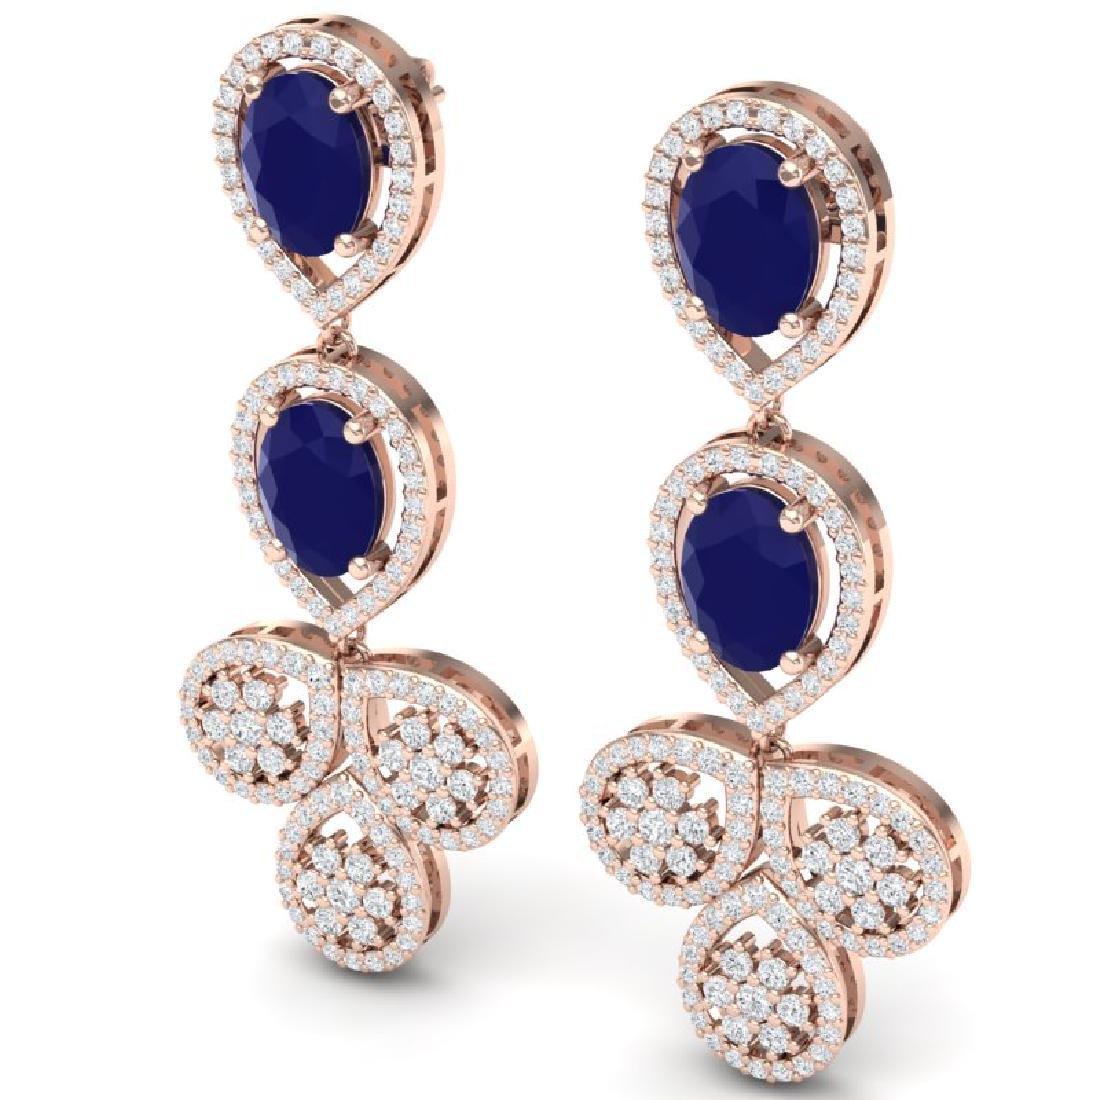 9.75 CTW Royalty Sapphire & VS Diamond Earrings 18K - 2